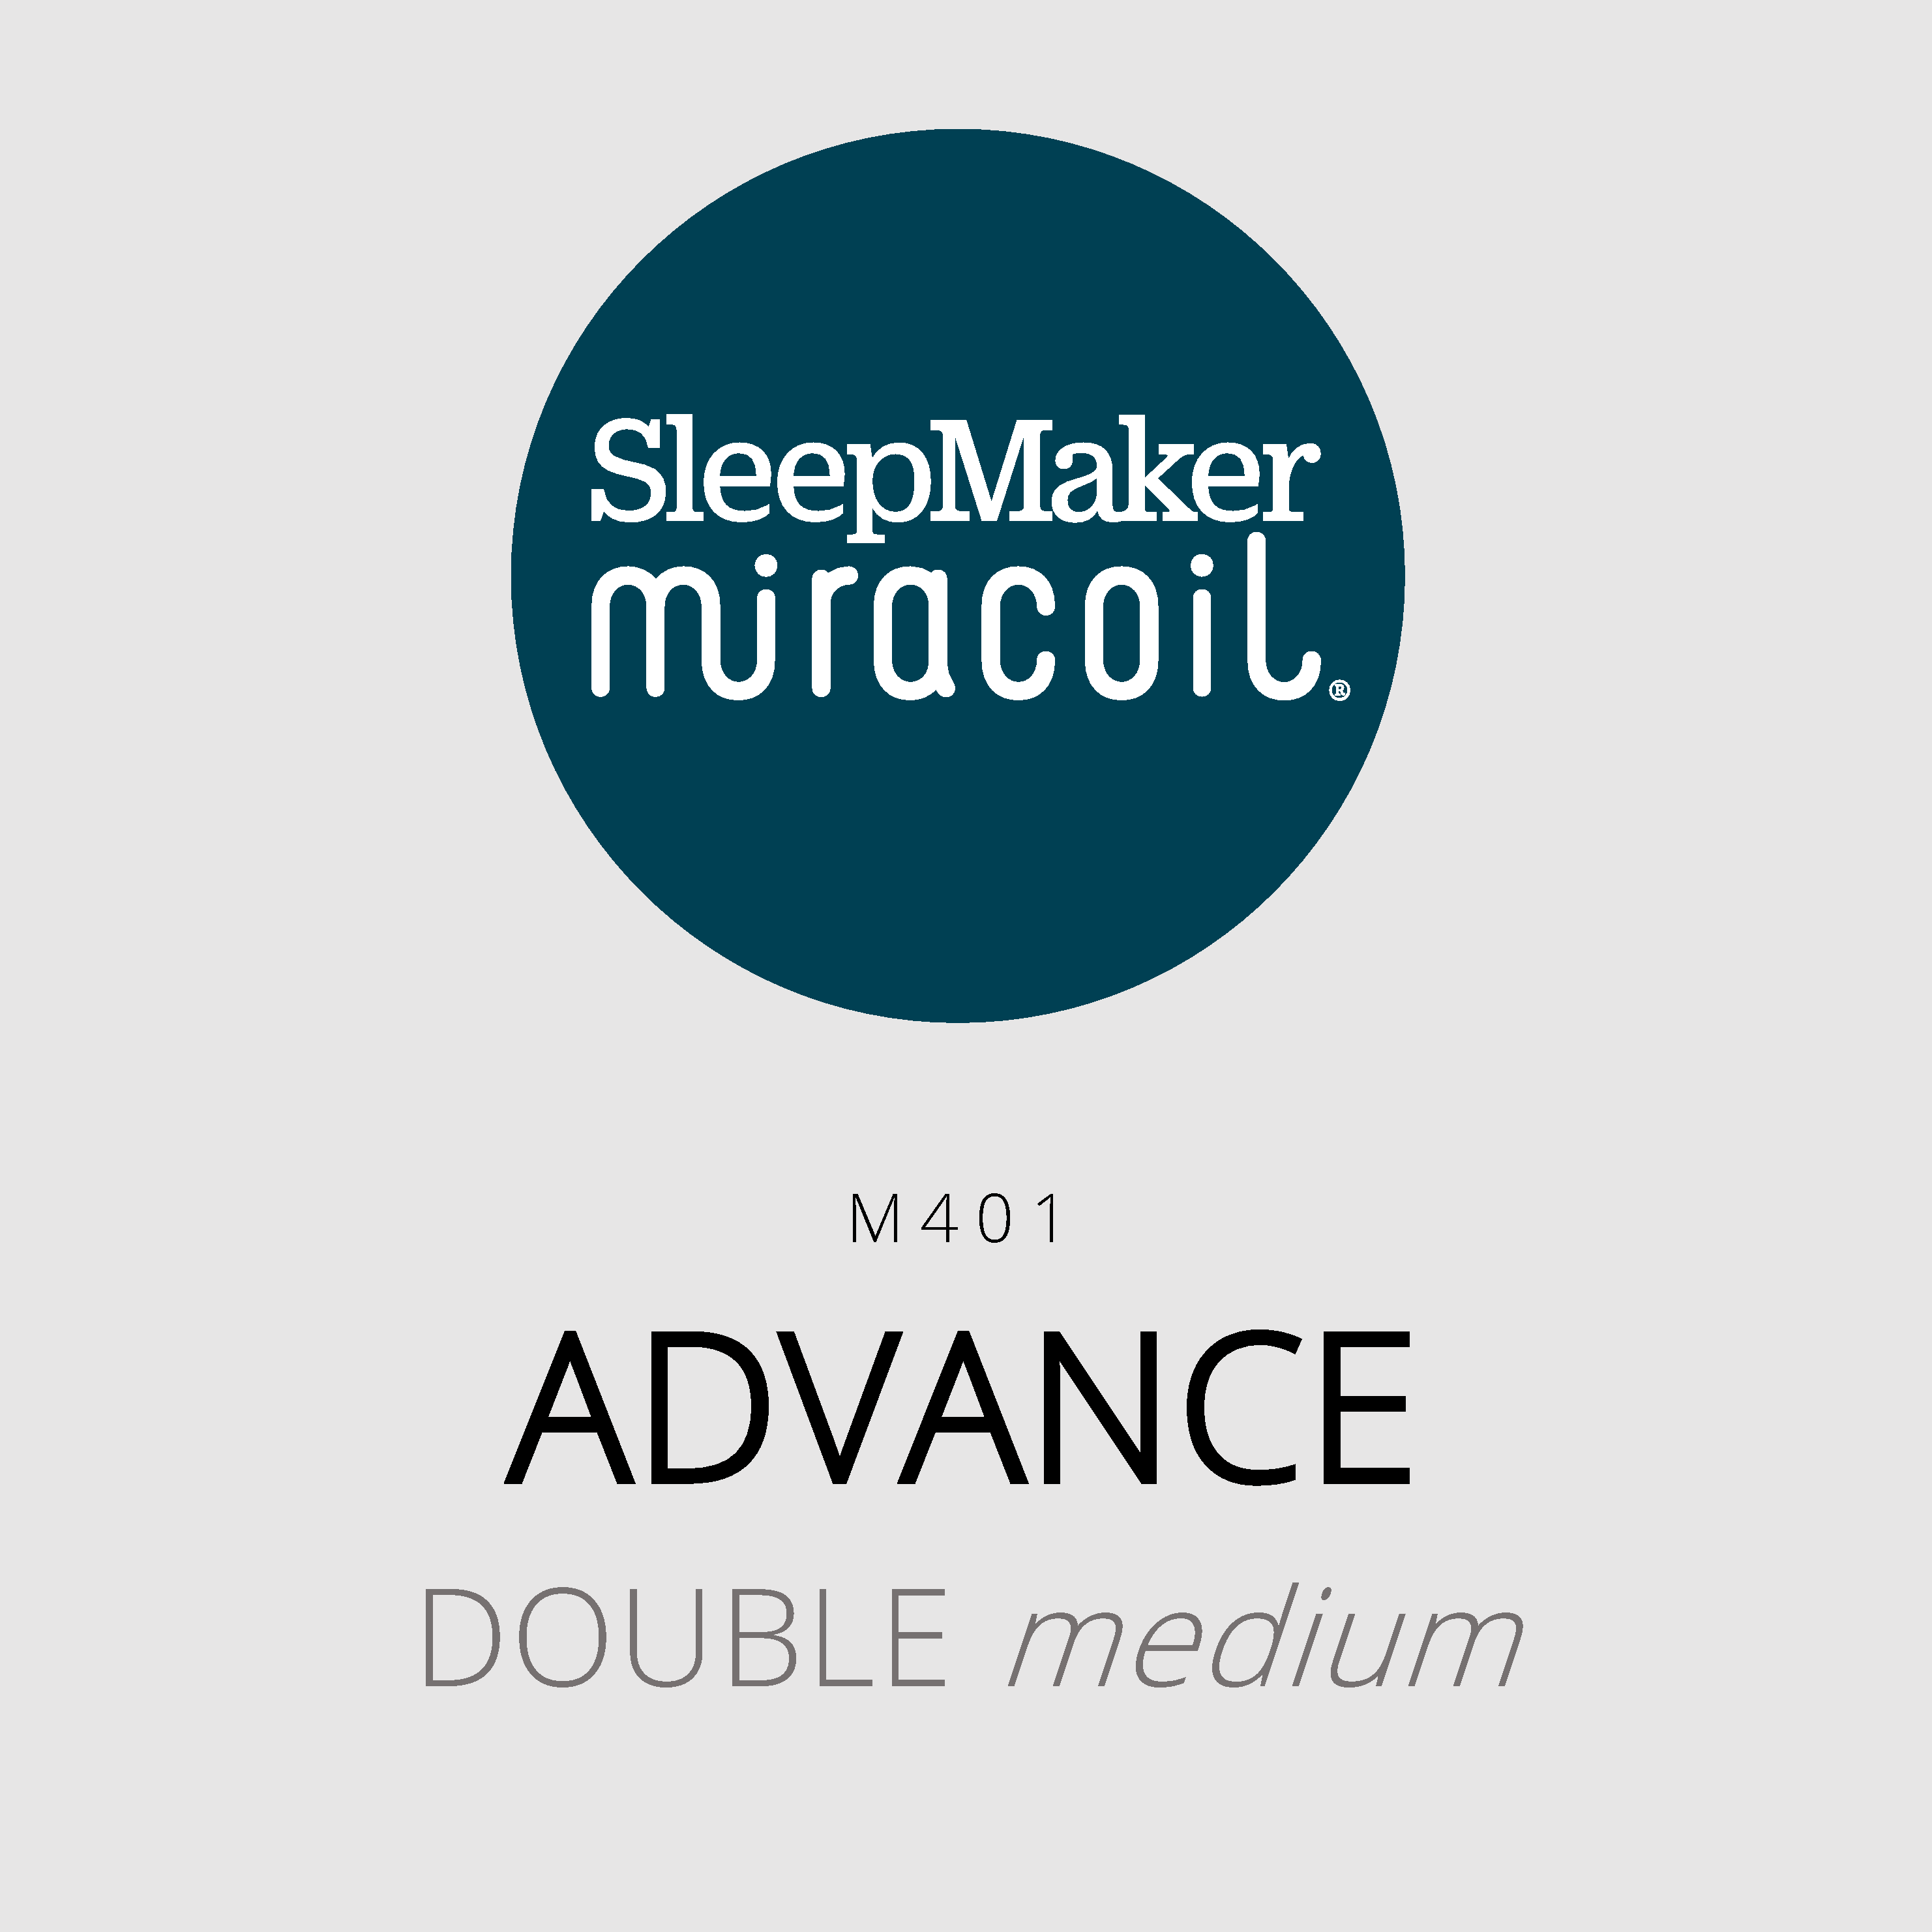 SleepMaker Miracoil – Advance – M401 – Double Medium Mattress